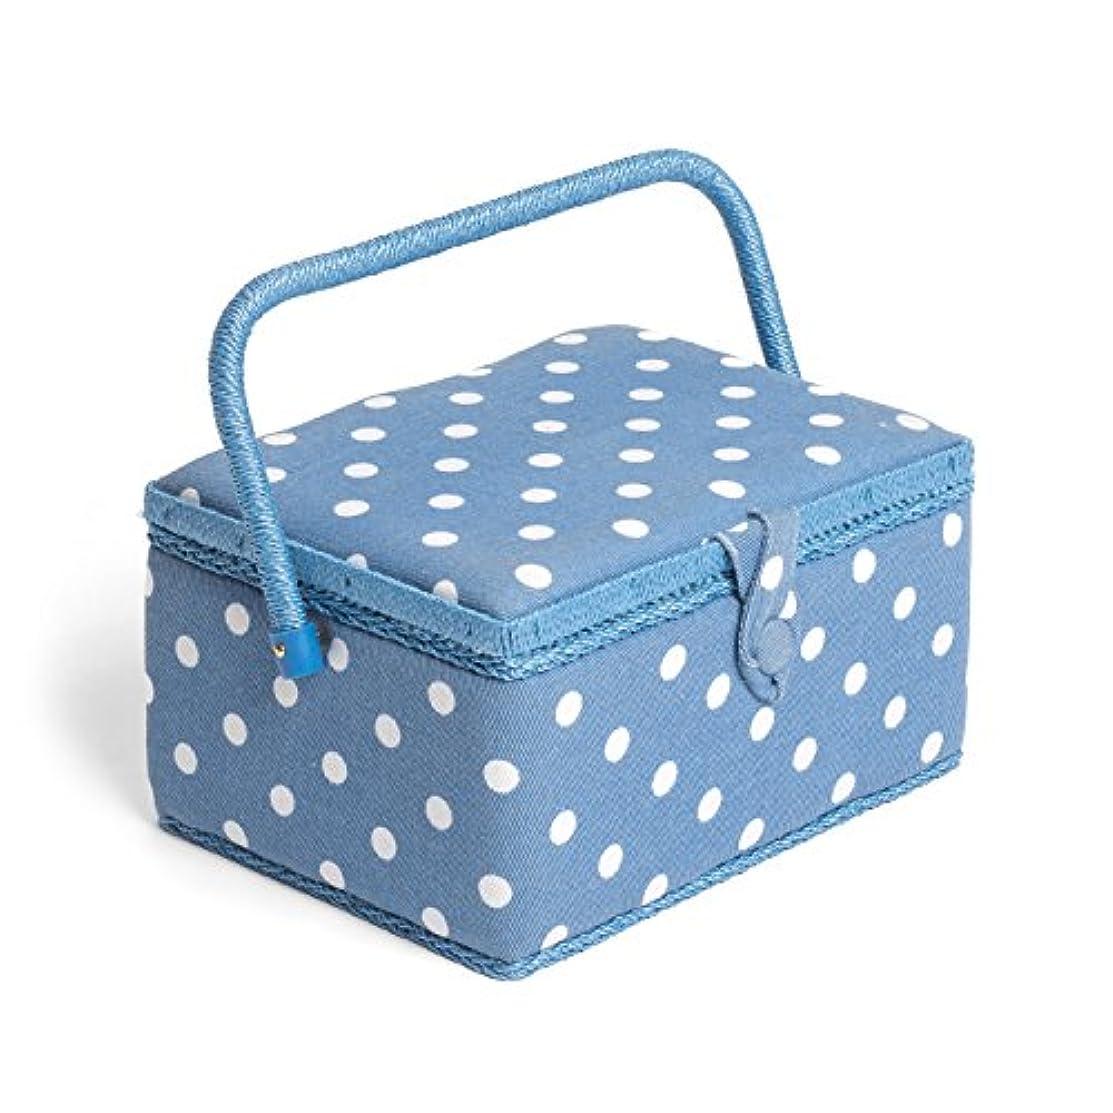 Hobby Gift MRM/188 | Denim Spot Print Medium Sewing Basket | 18.5x26x15cm